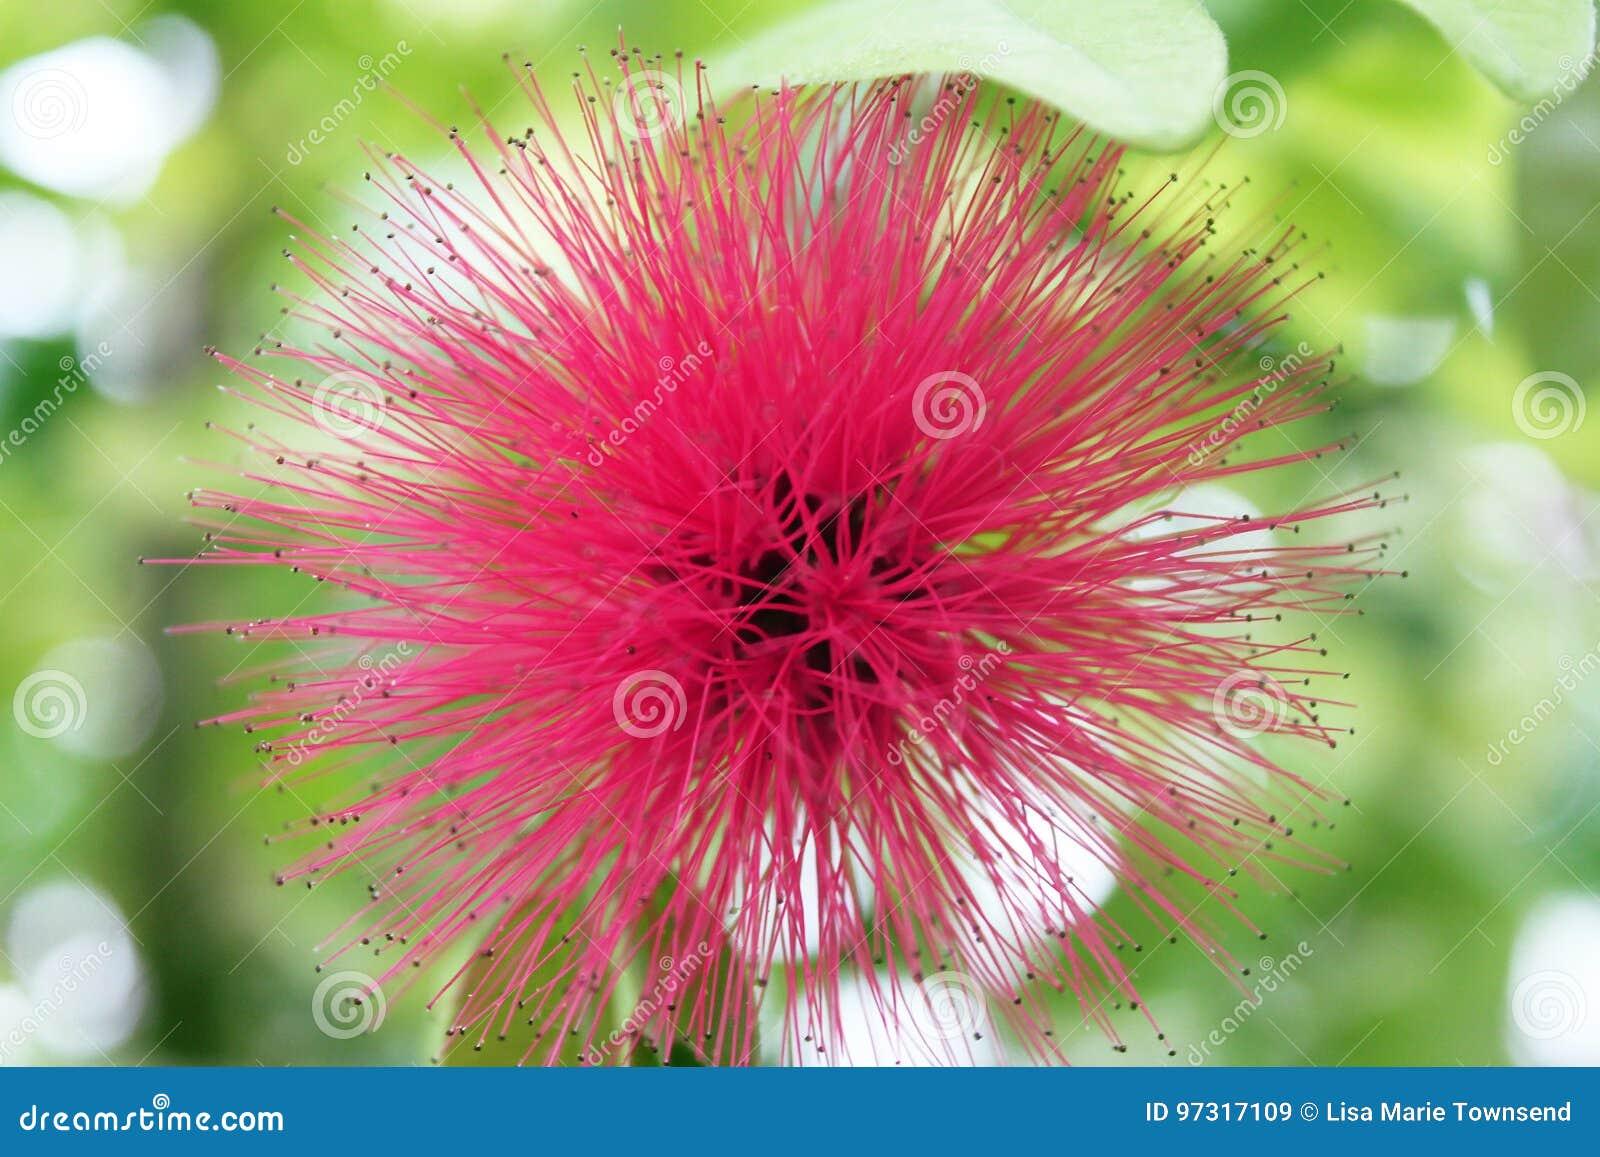 Pink Spiky Flower Stock Image Image Of Australian Petal 97317109